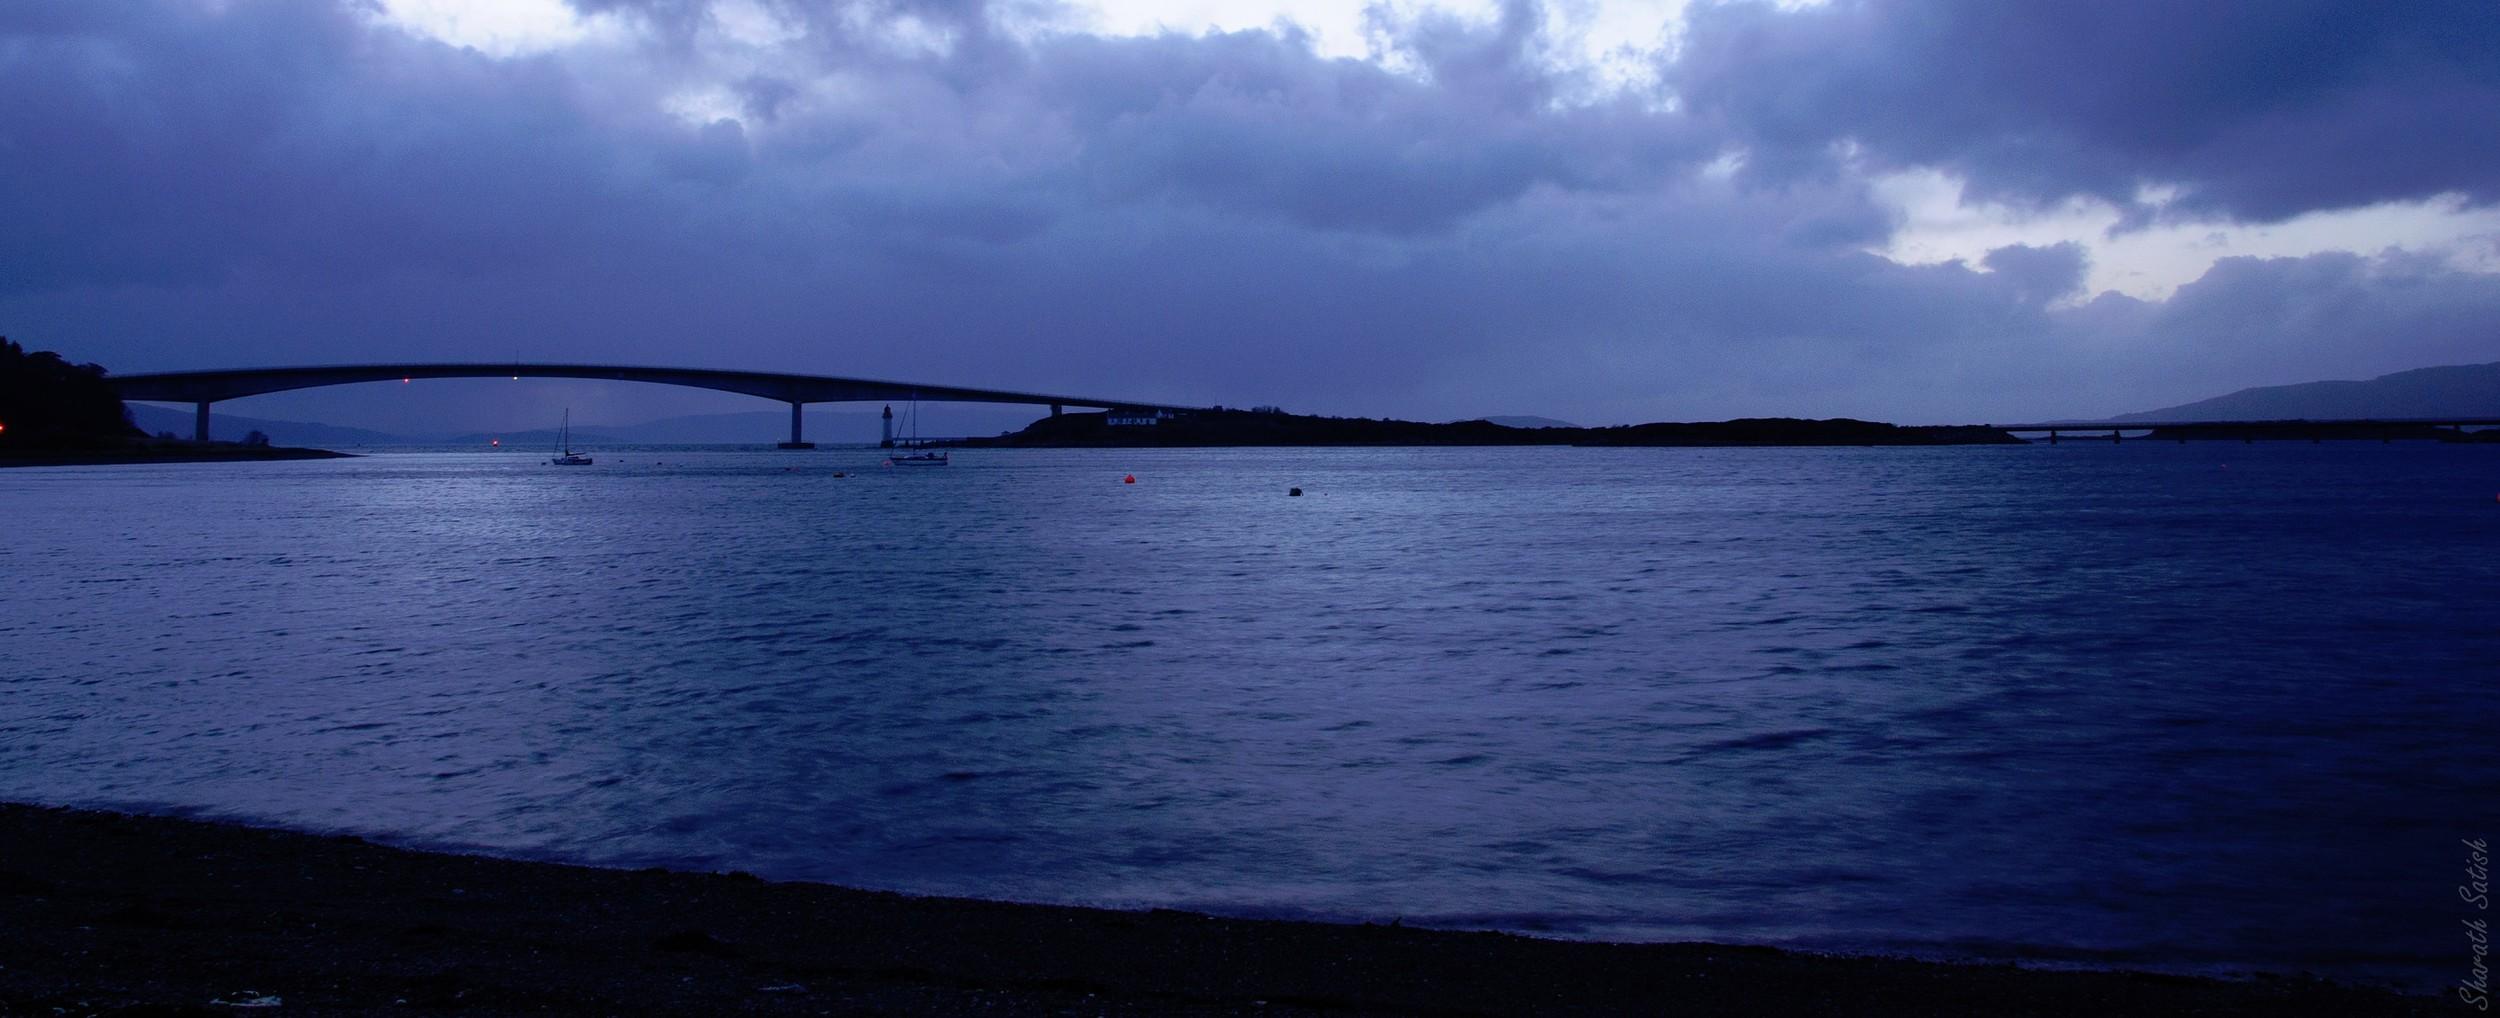 A bridge to the Winged Isle